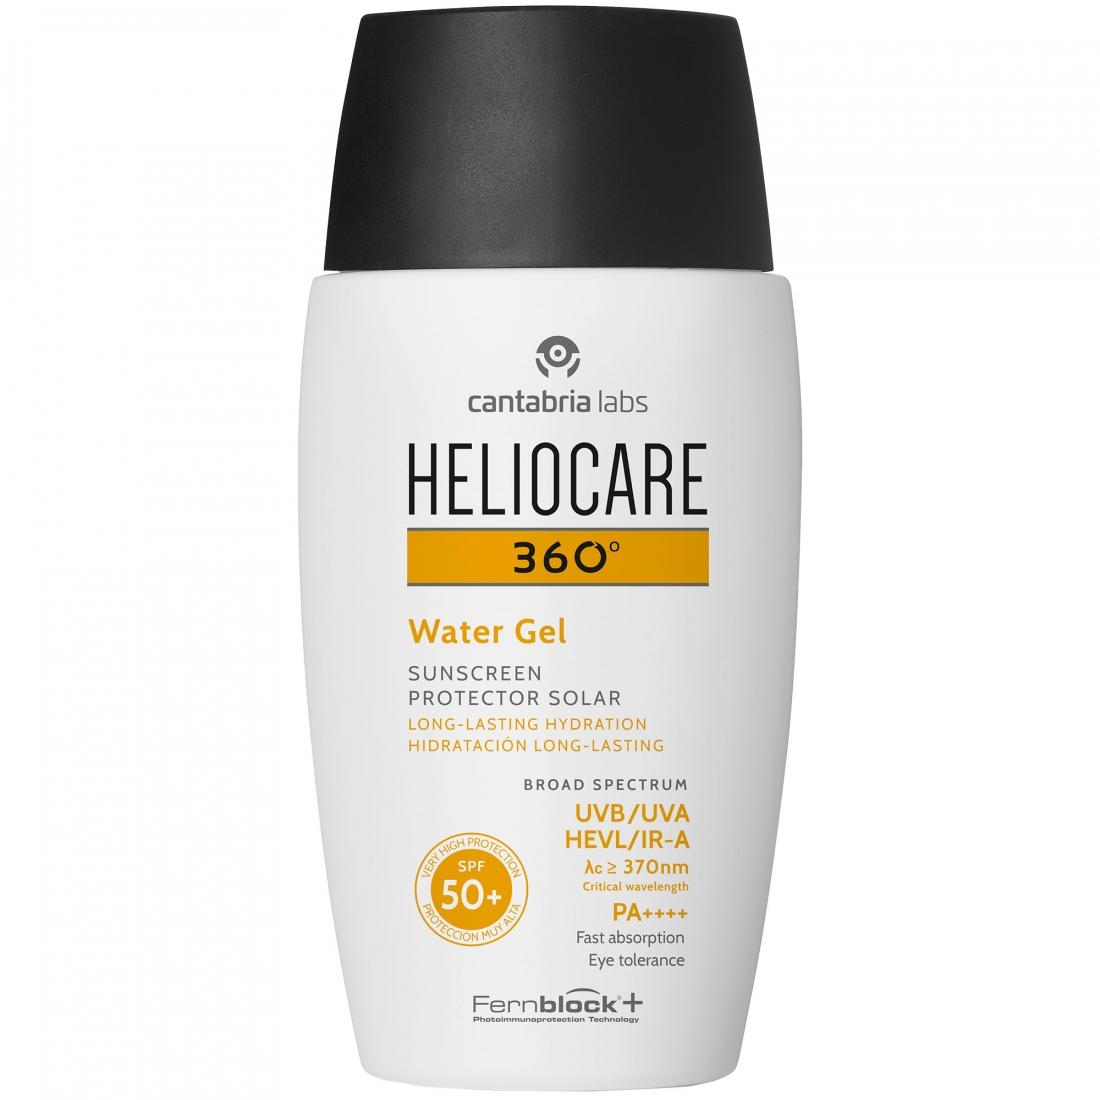 Heliocare Water Gel SPF 50